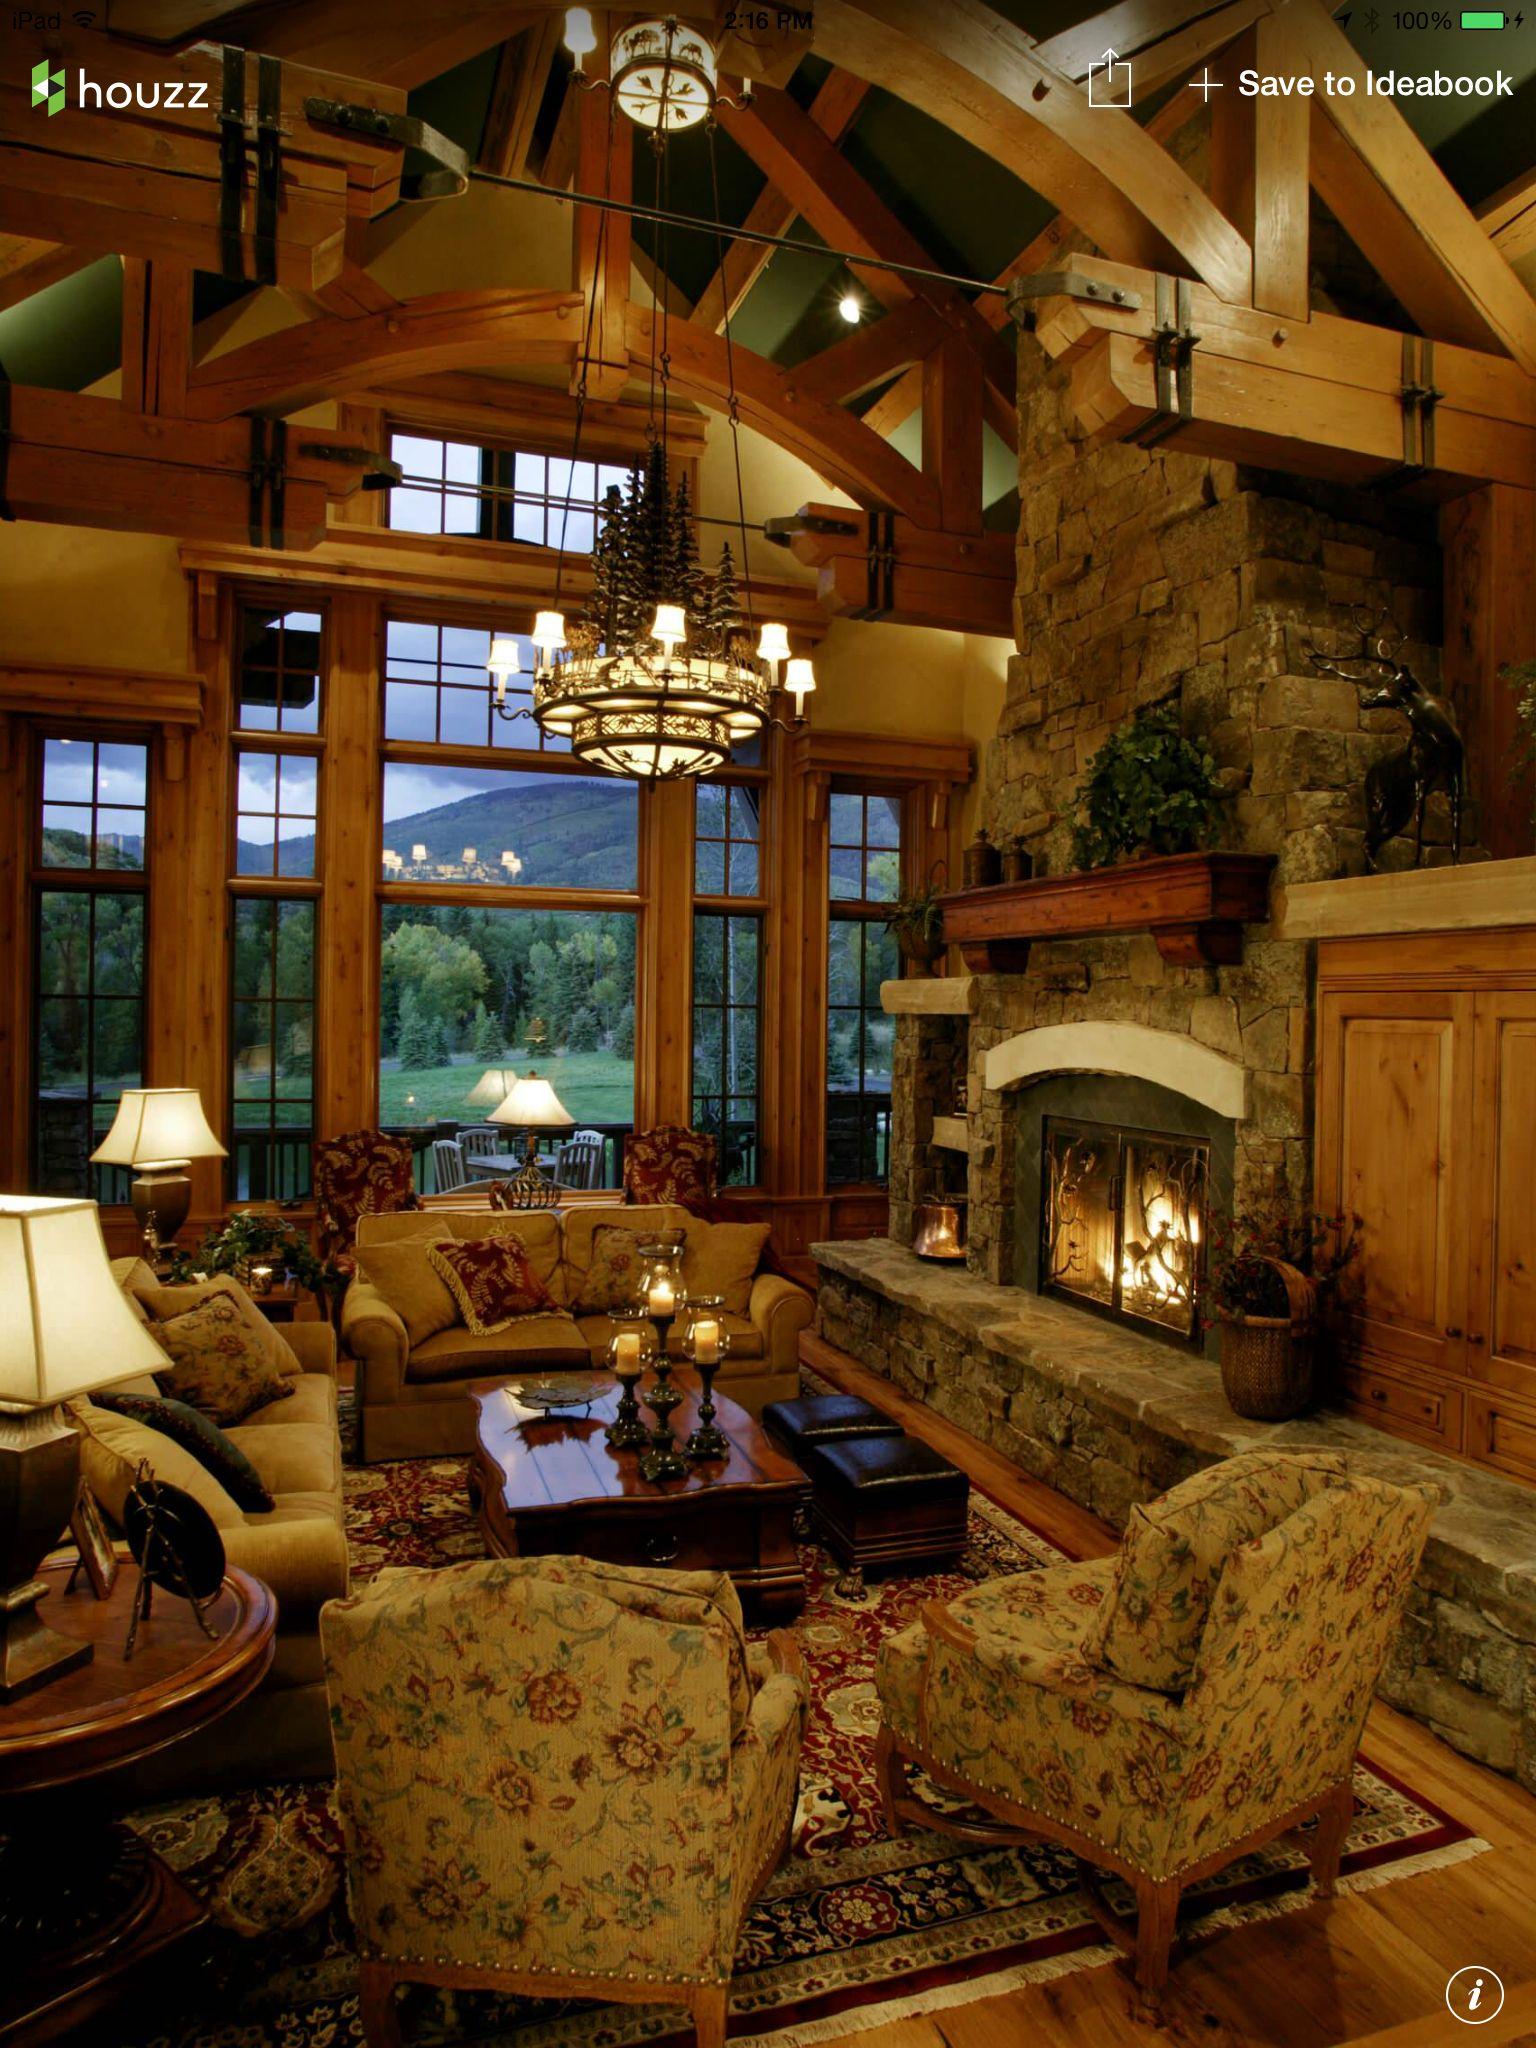 Houzz Cottage Living Room: Cabin Living Like A Boss #houzz